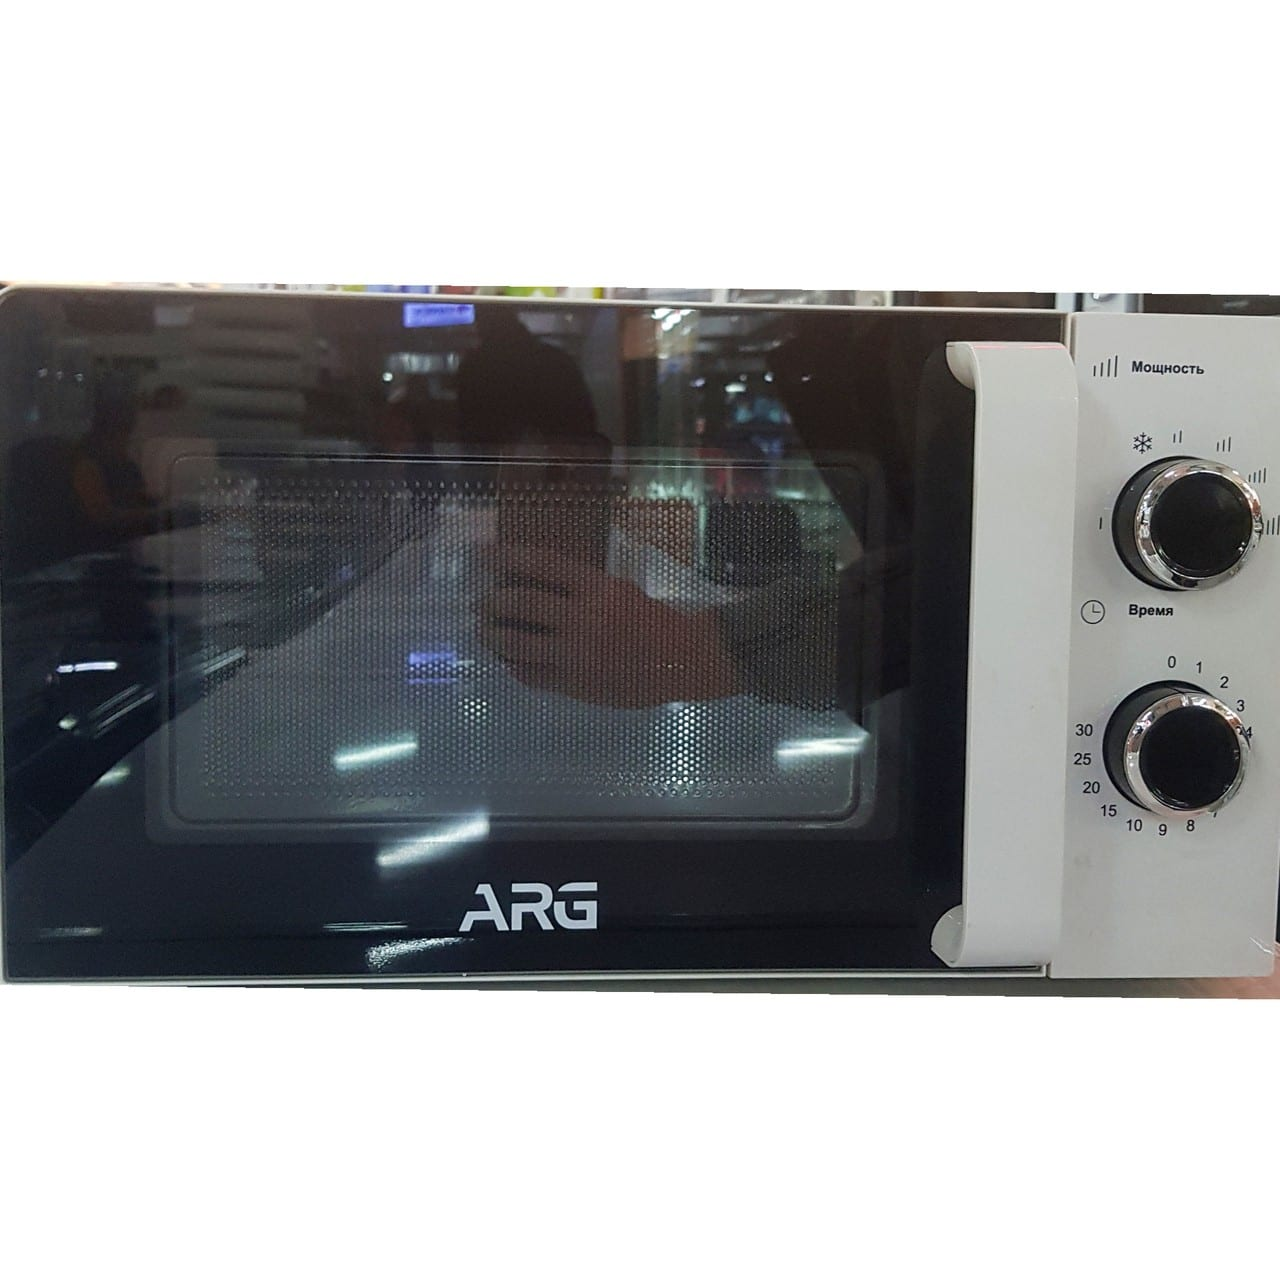 Микроволновка ARG 700 Вт